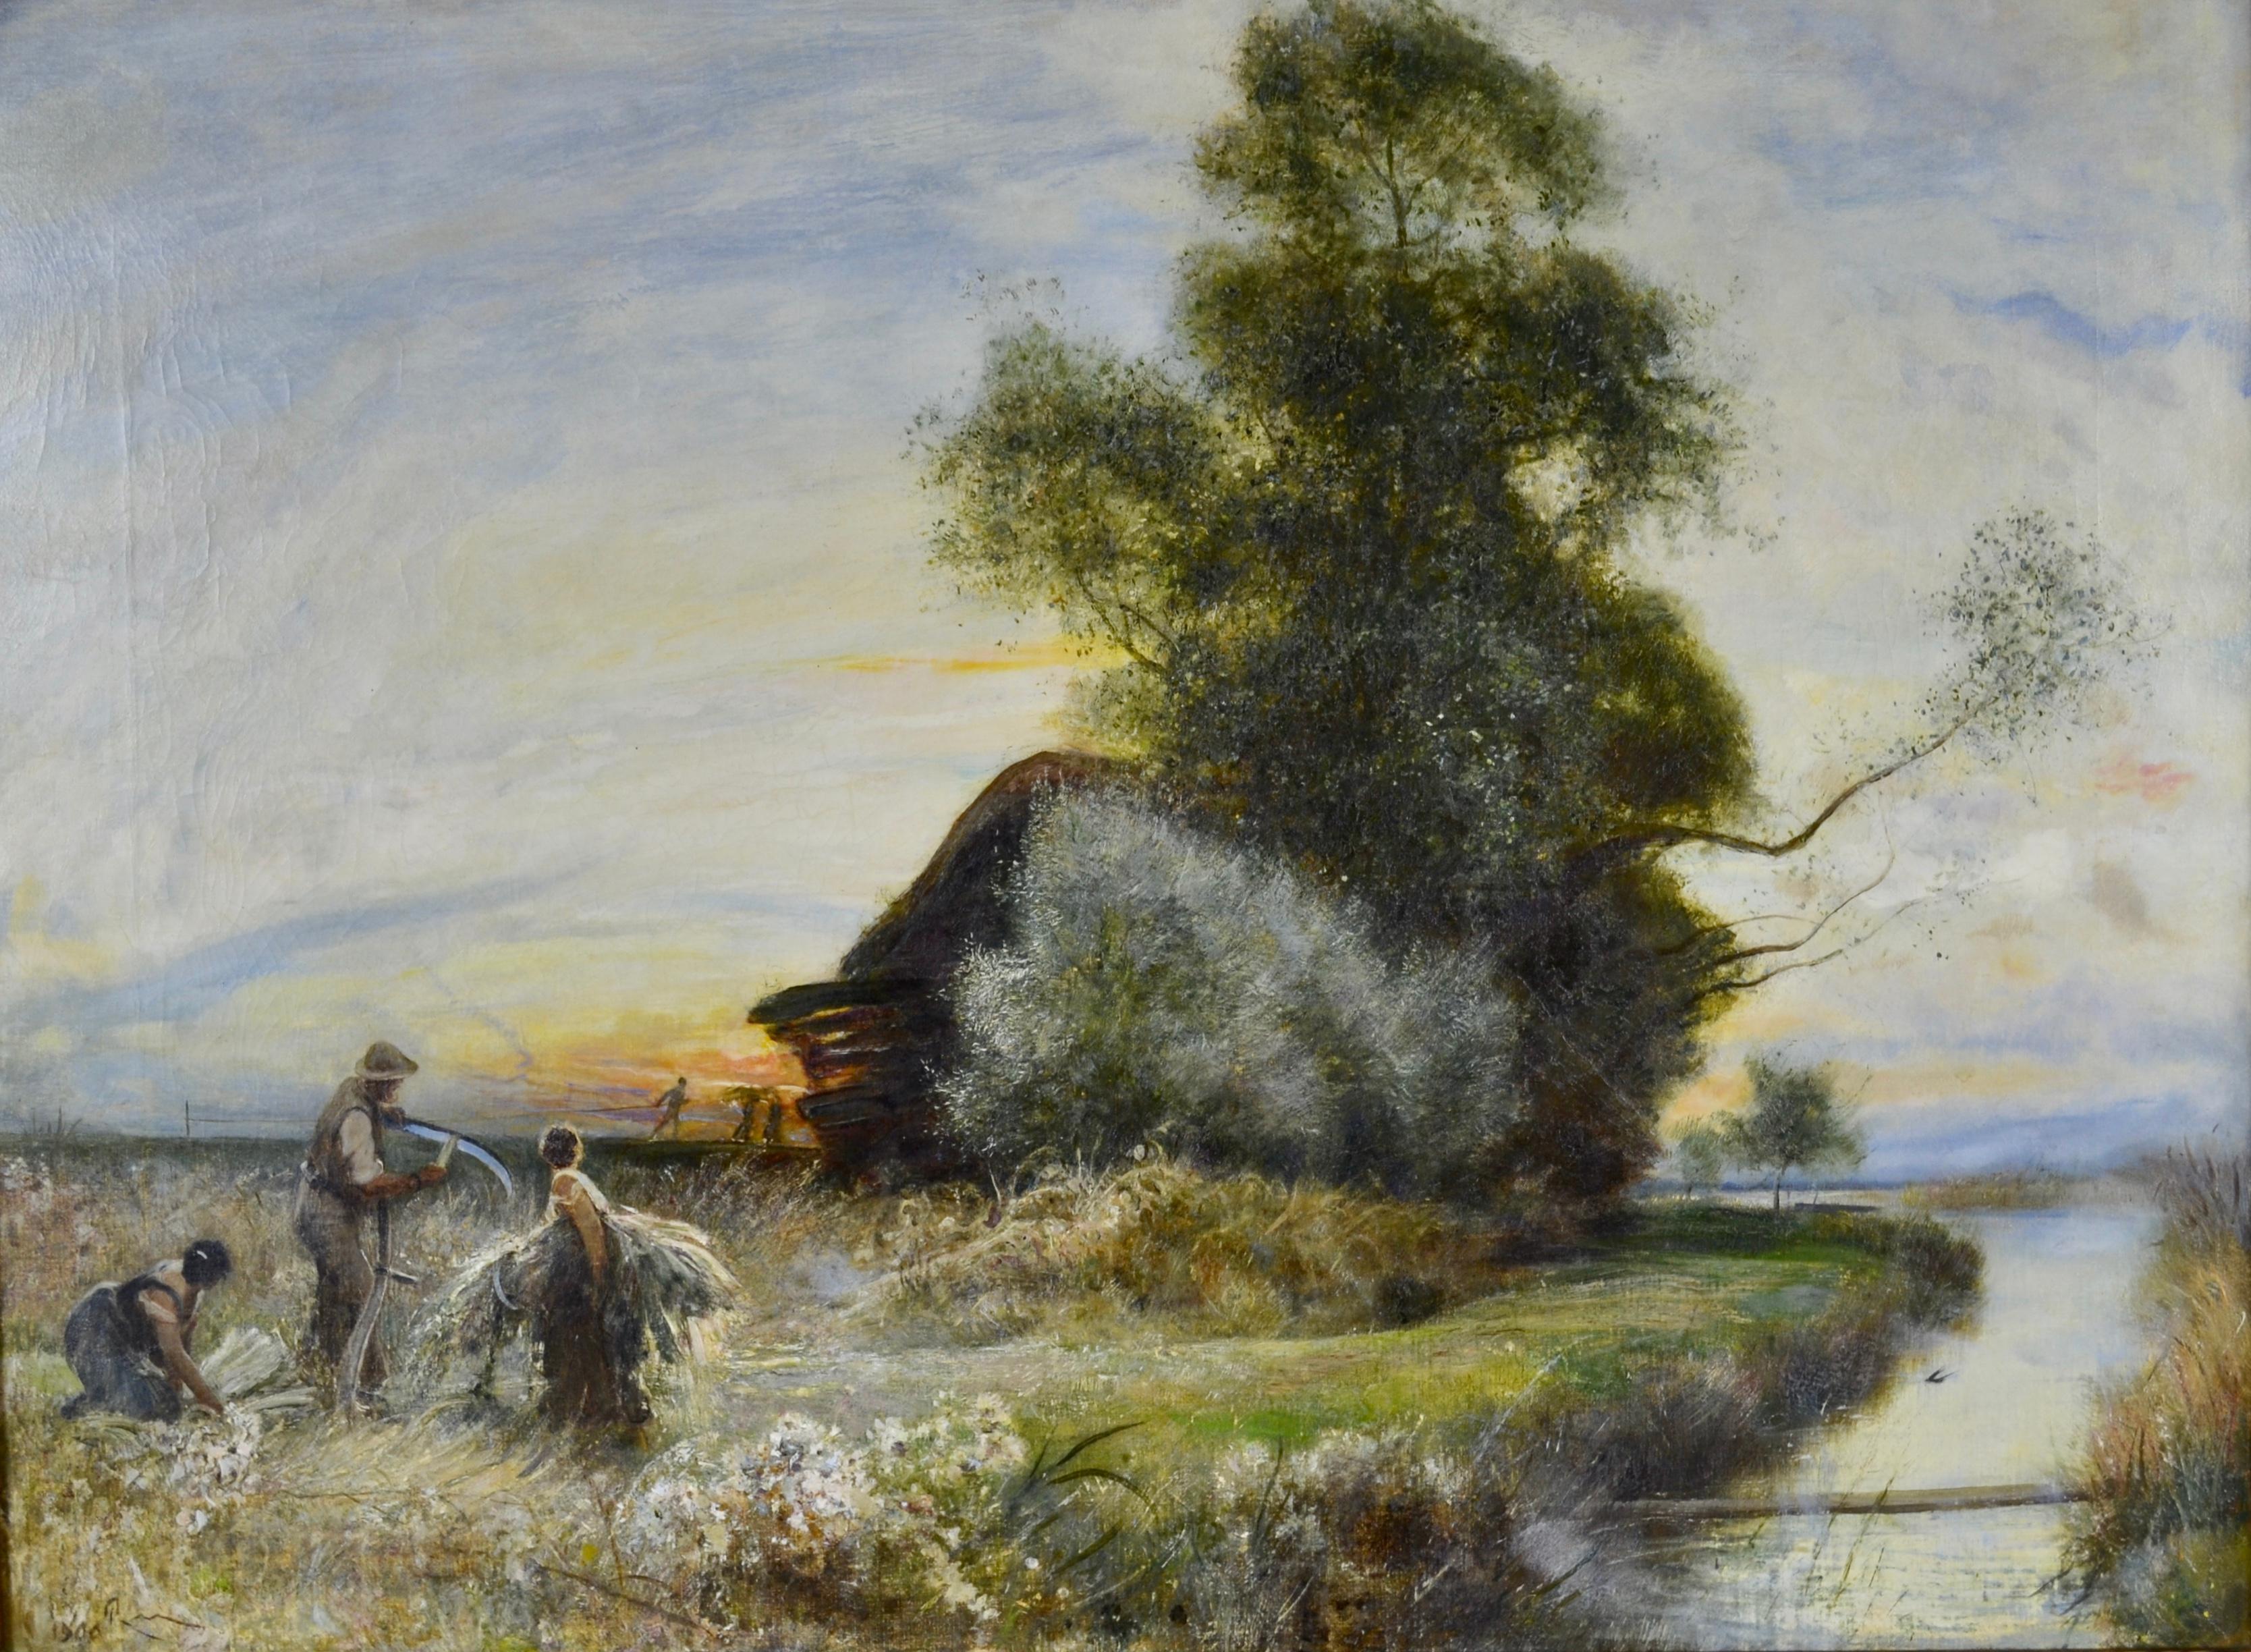 Fenland Reed Cutters - Victorian Idyllist landscape painting by Walker Macbeth